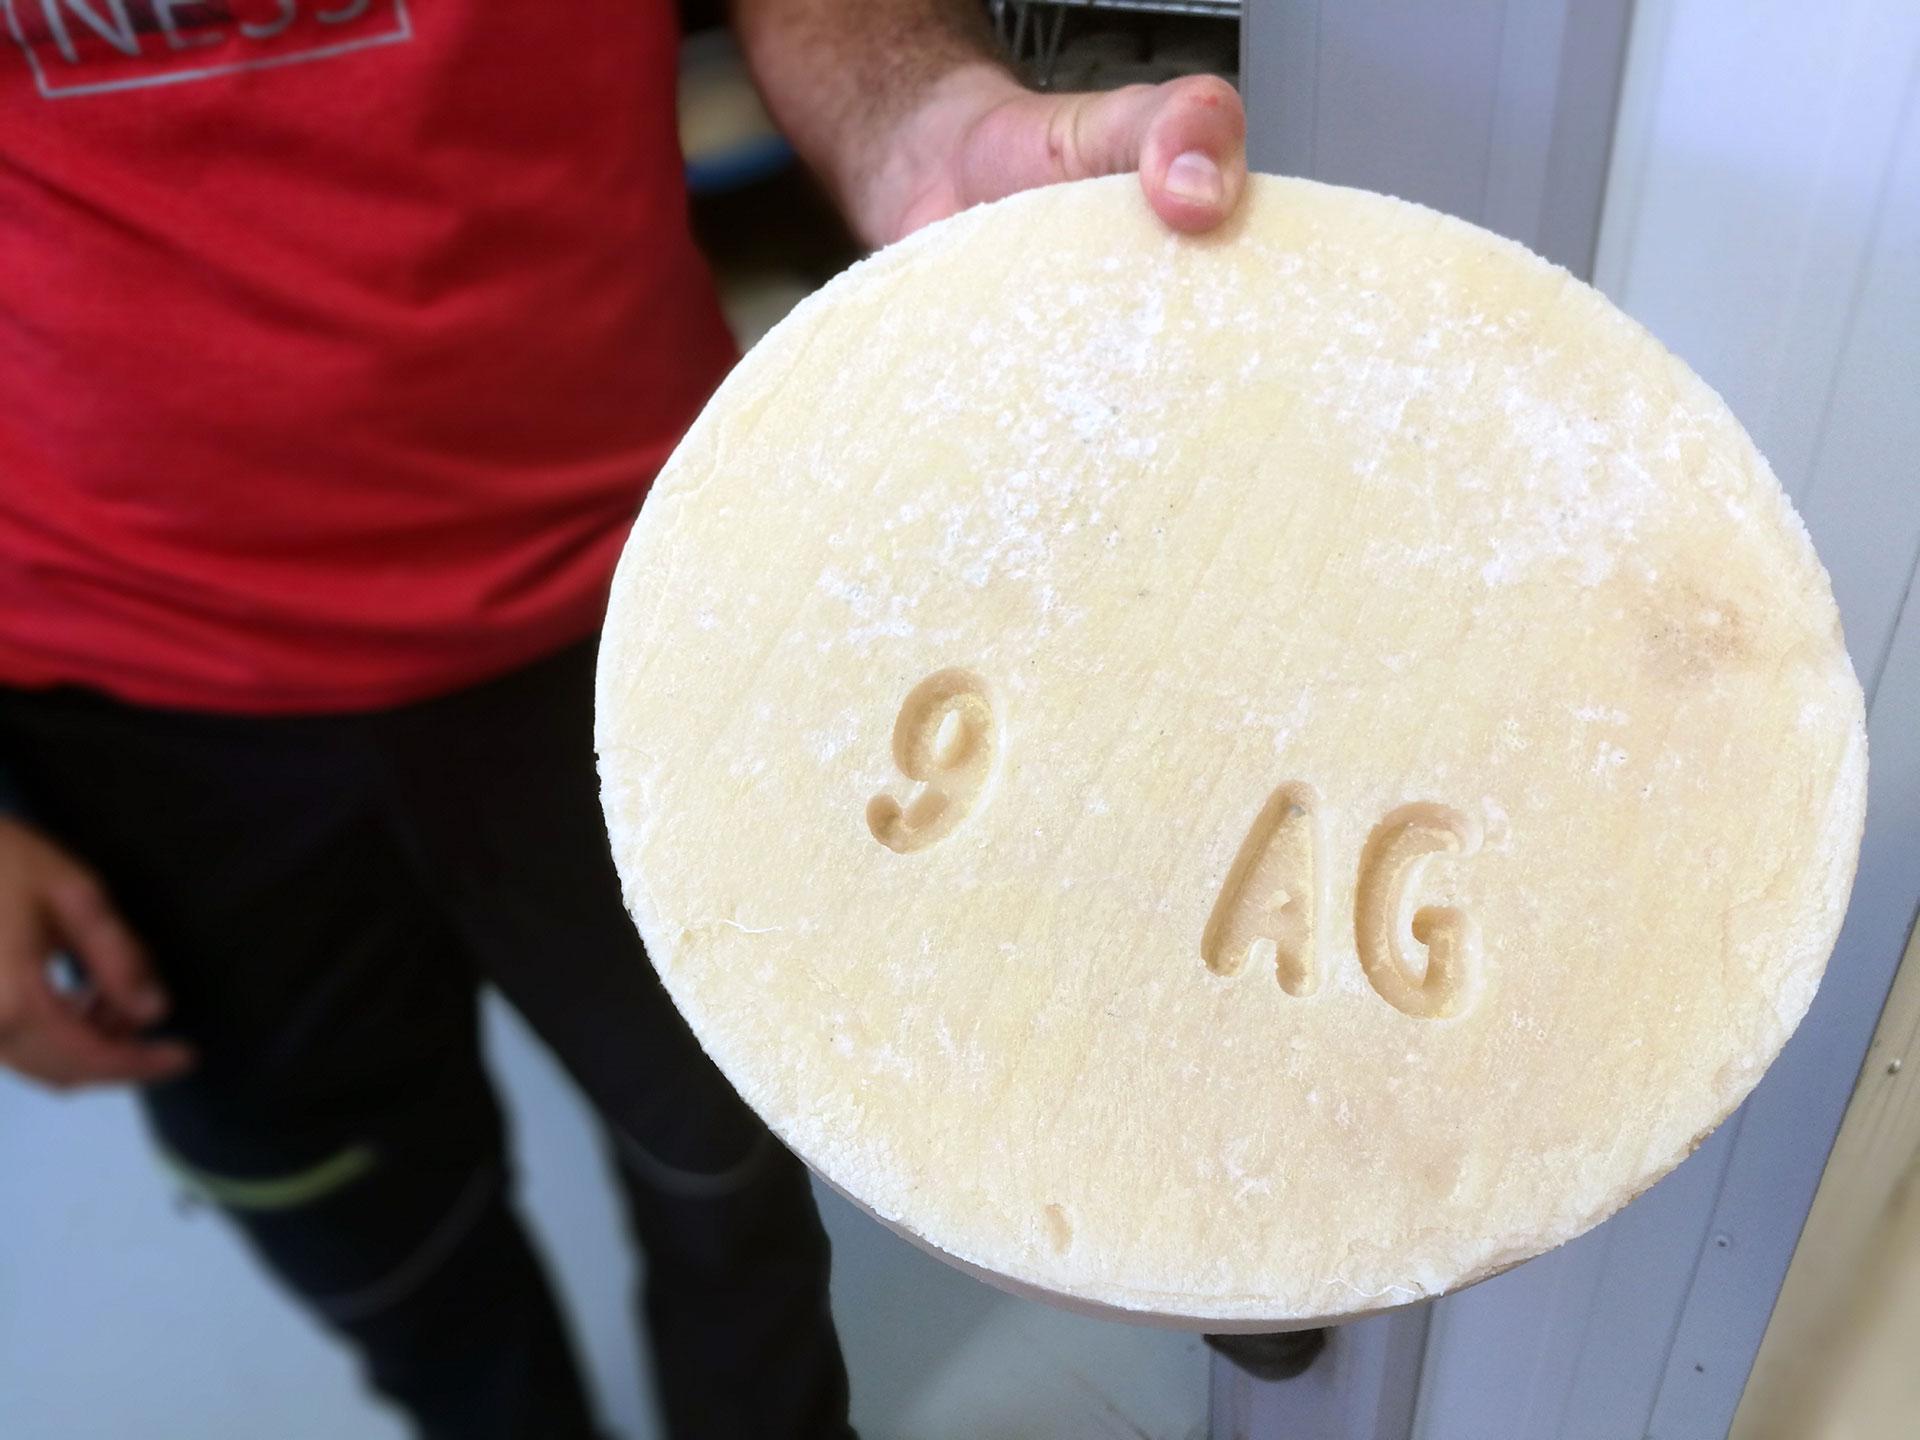 https://aborigensbarcelona.com/wp-content/uploads/2020/03/cheese.jpg